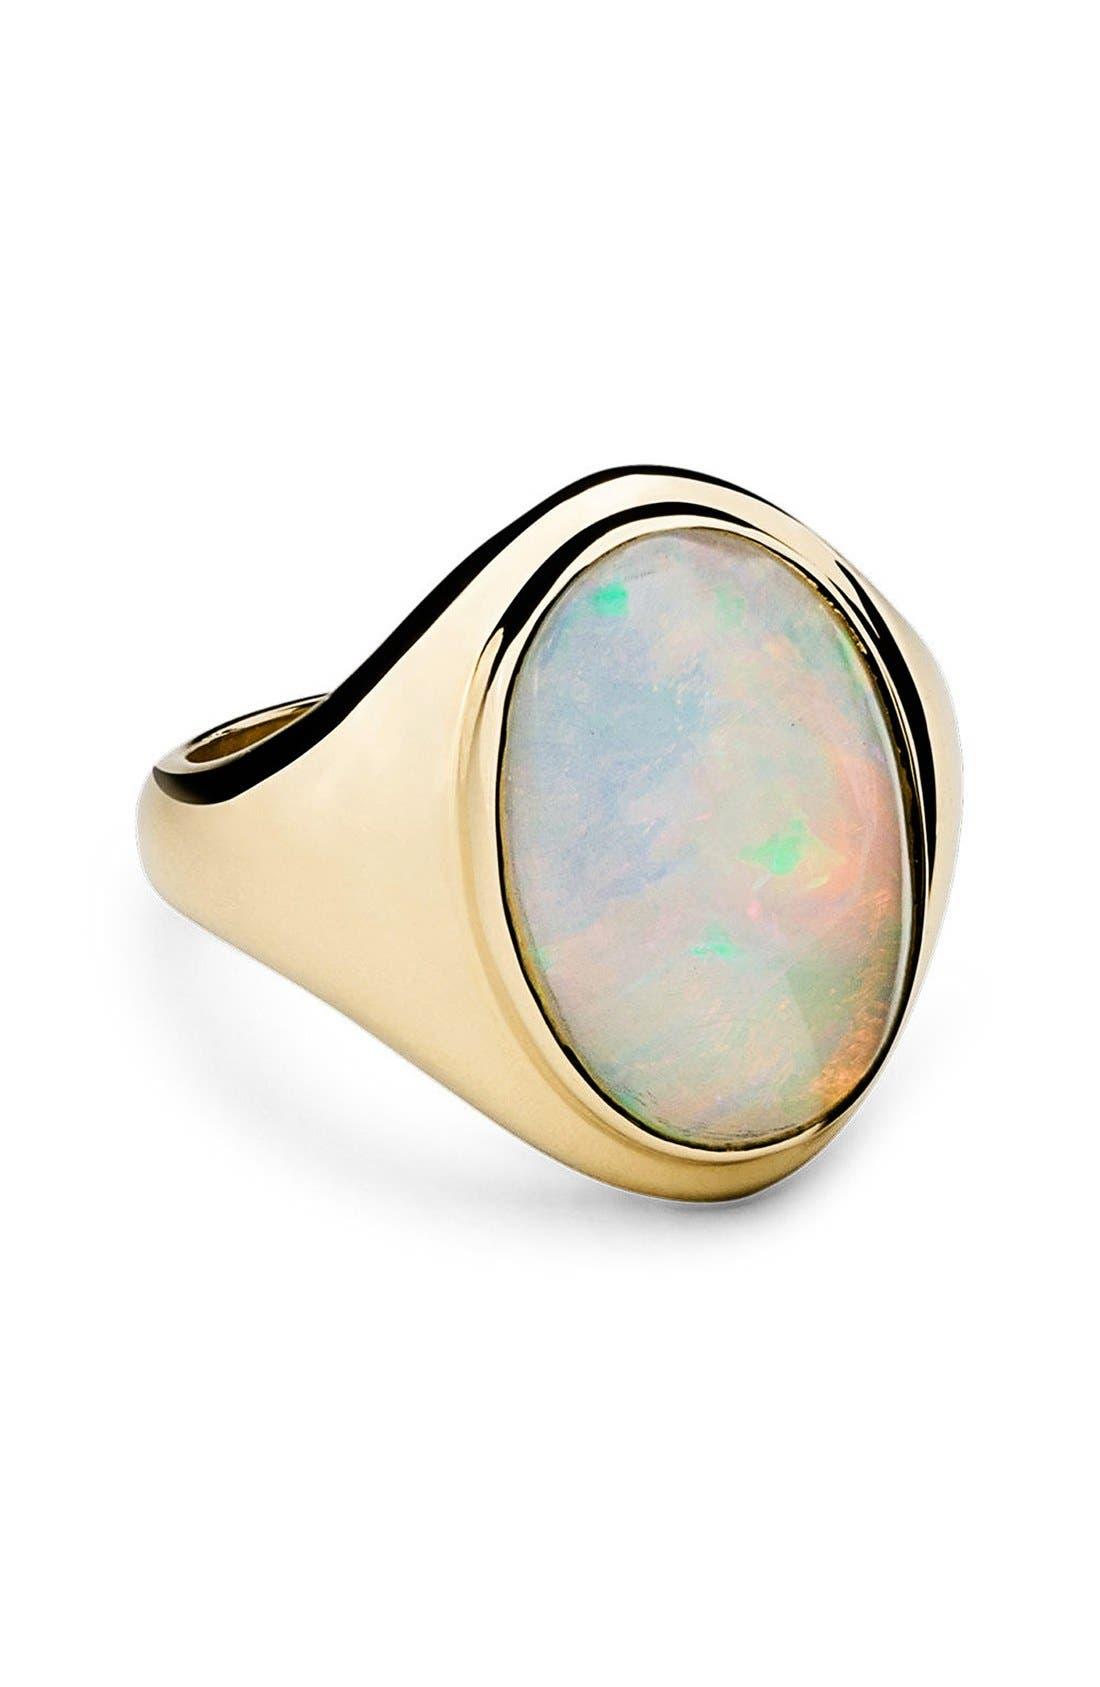 Alternate Image 1 Selected - Shinola Opal Signet Ring